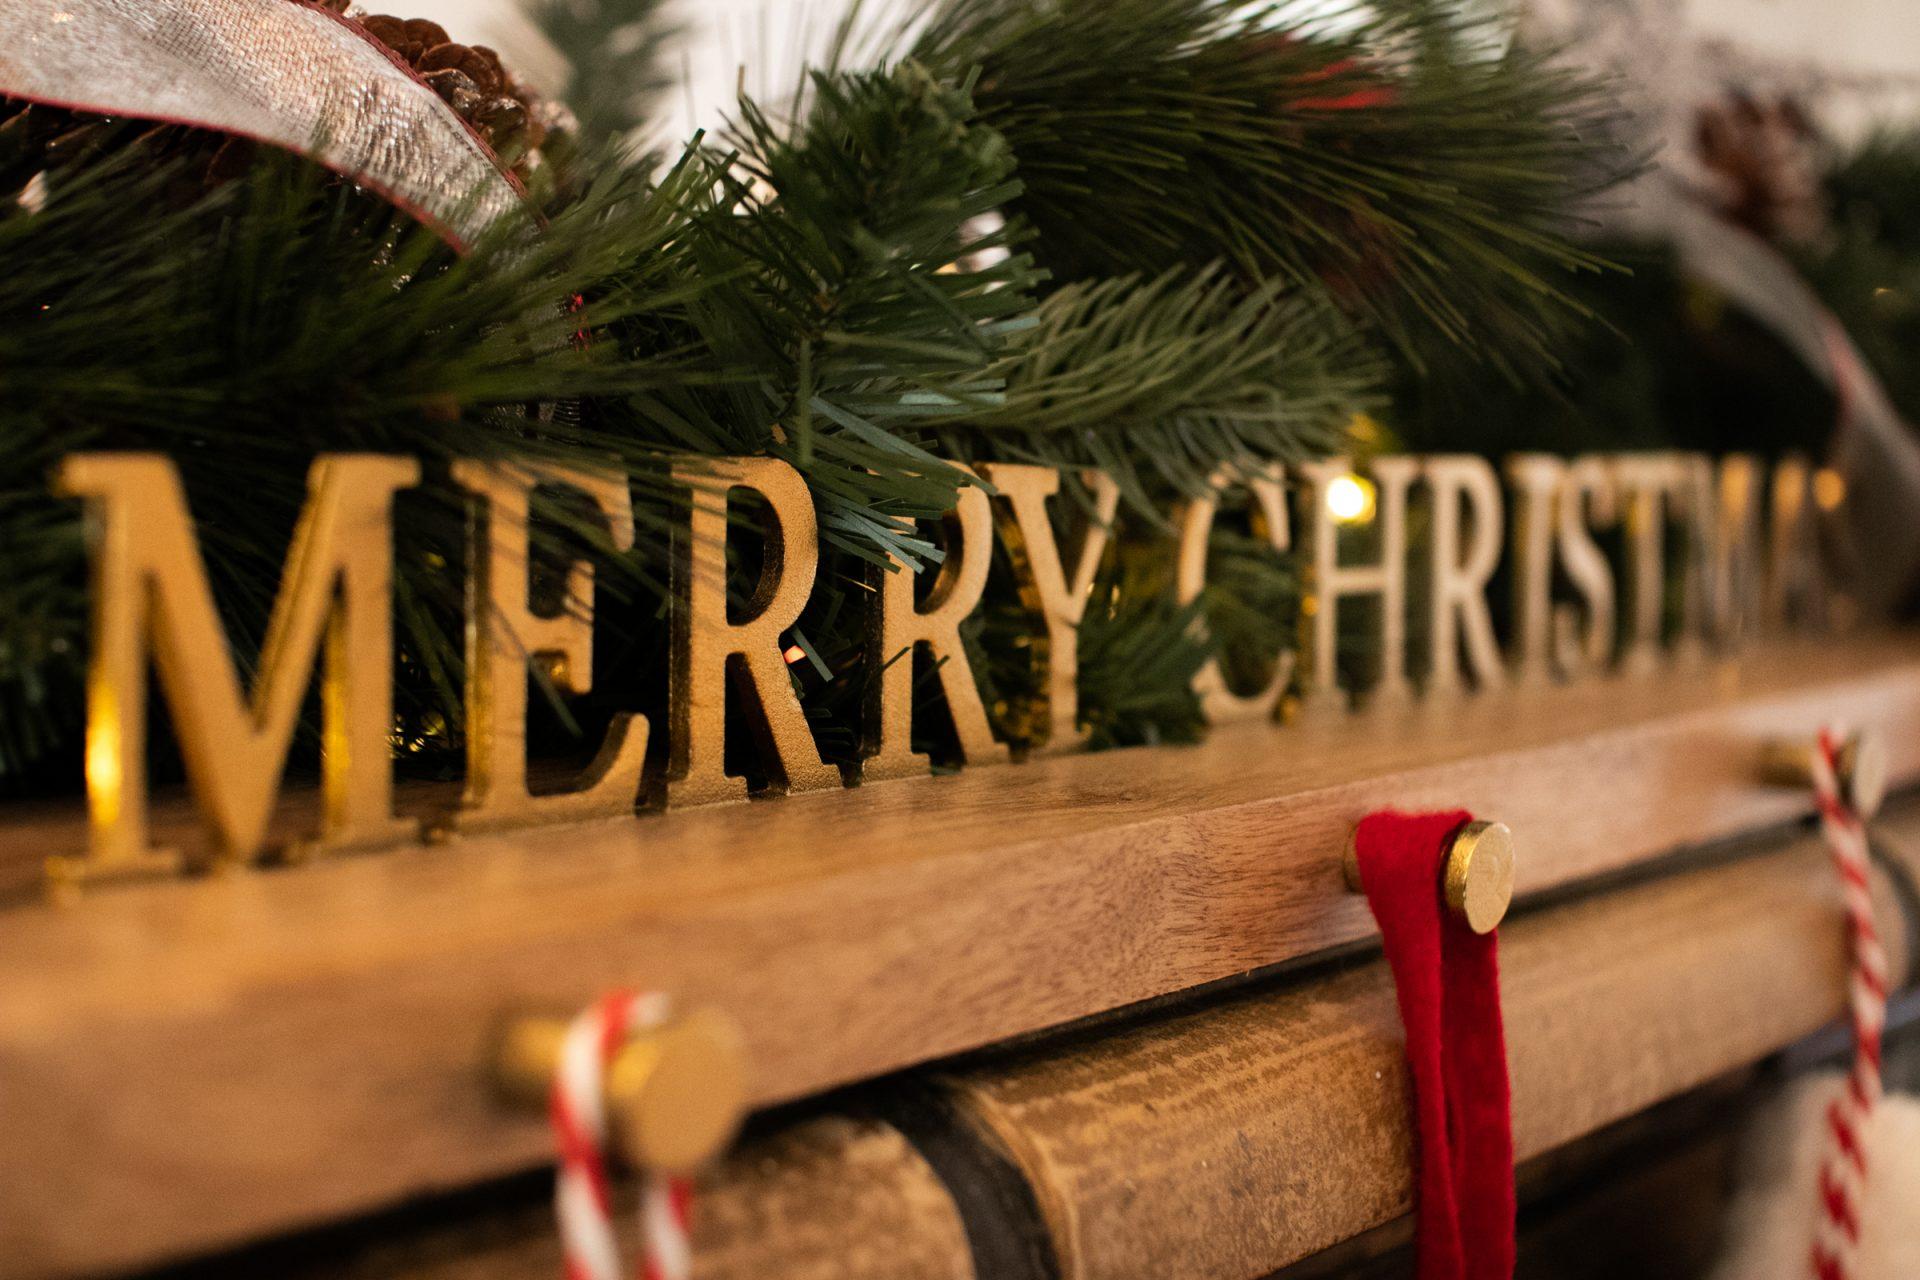 Decorations On Christmas Stocking Holder